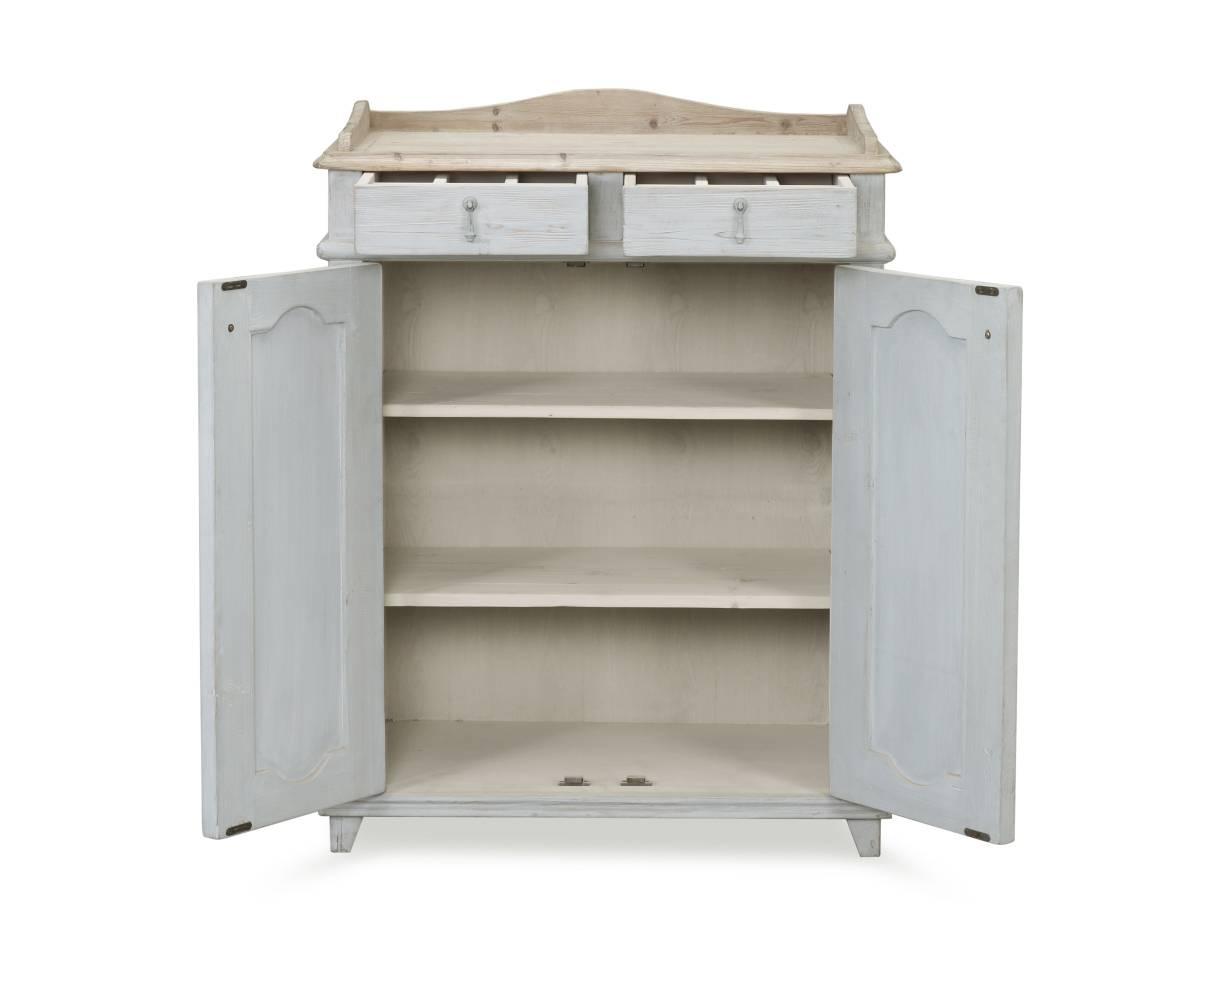 Teardrop Sideboard | Wooden Kitchen Sideboard | Loaf In Narrow Kitchen Sideboards (View 2 of 15)